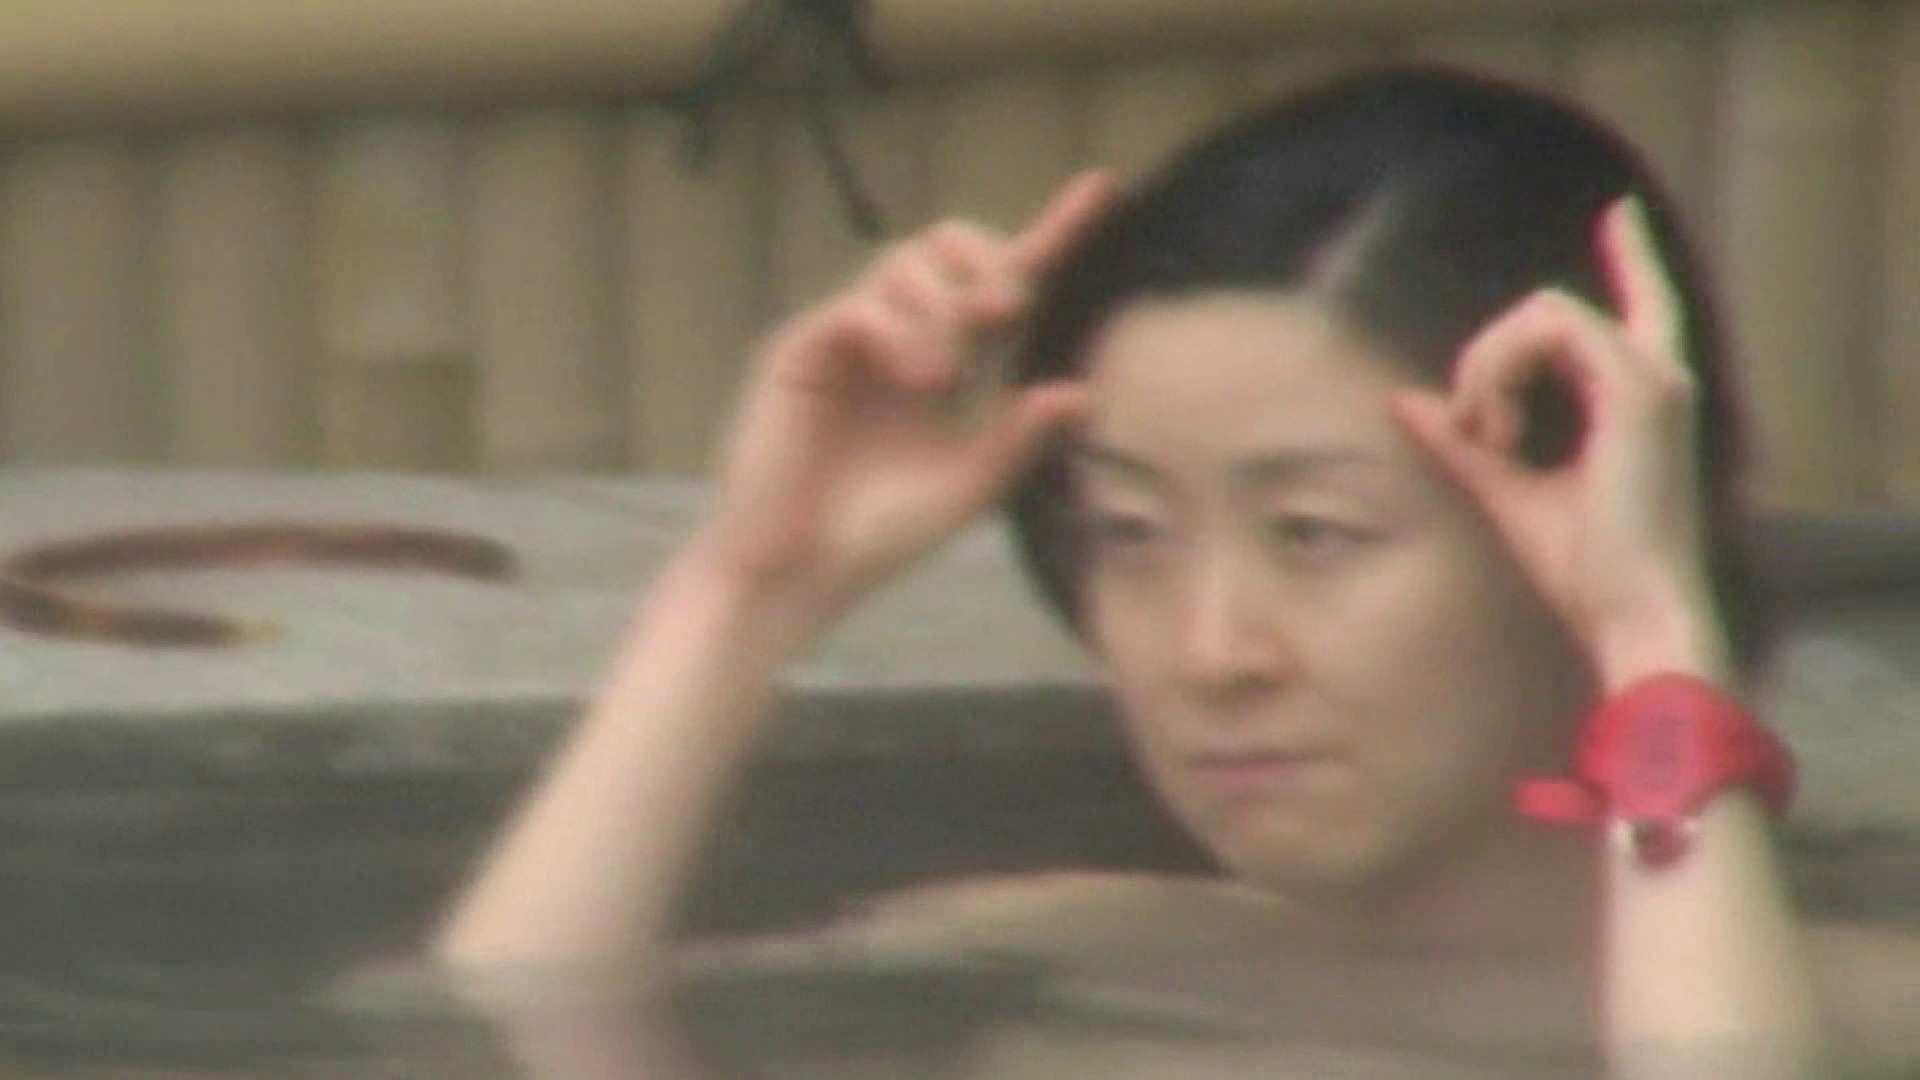 Aquaな露天風呂Vol.548 OLセックス のぞきエロ無料画像 103画像 32